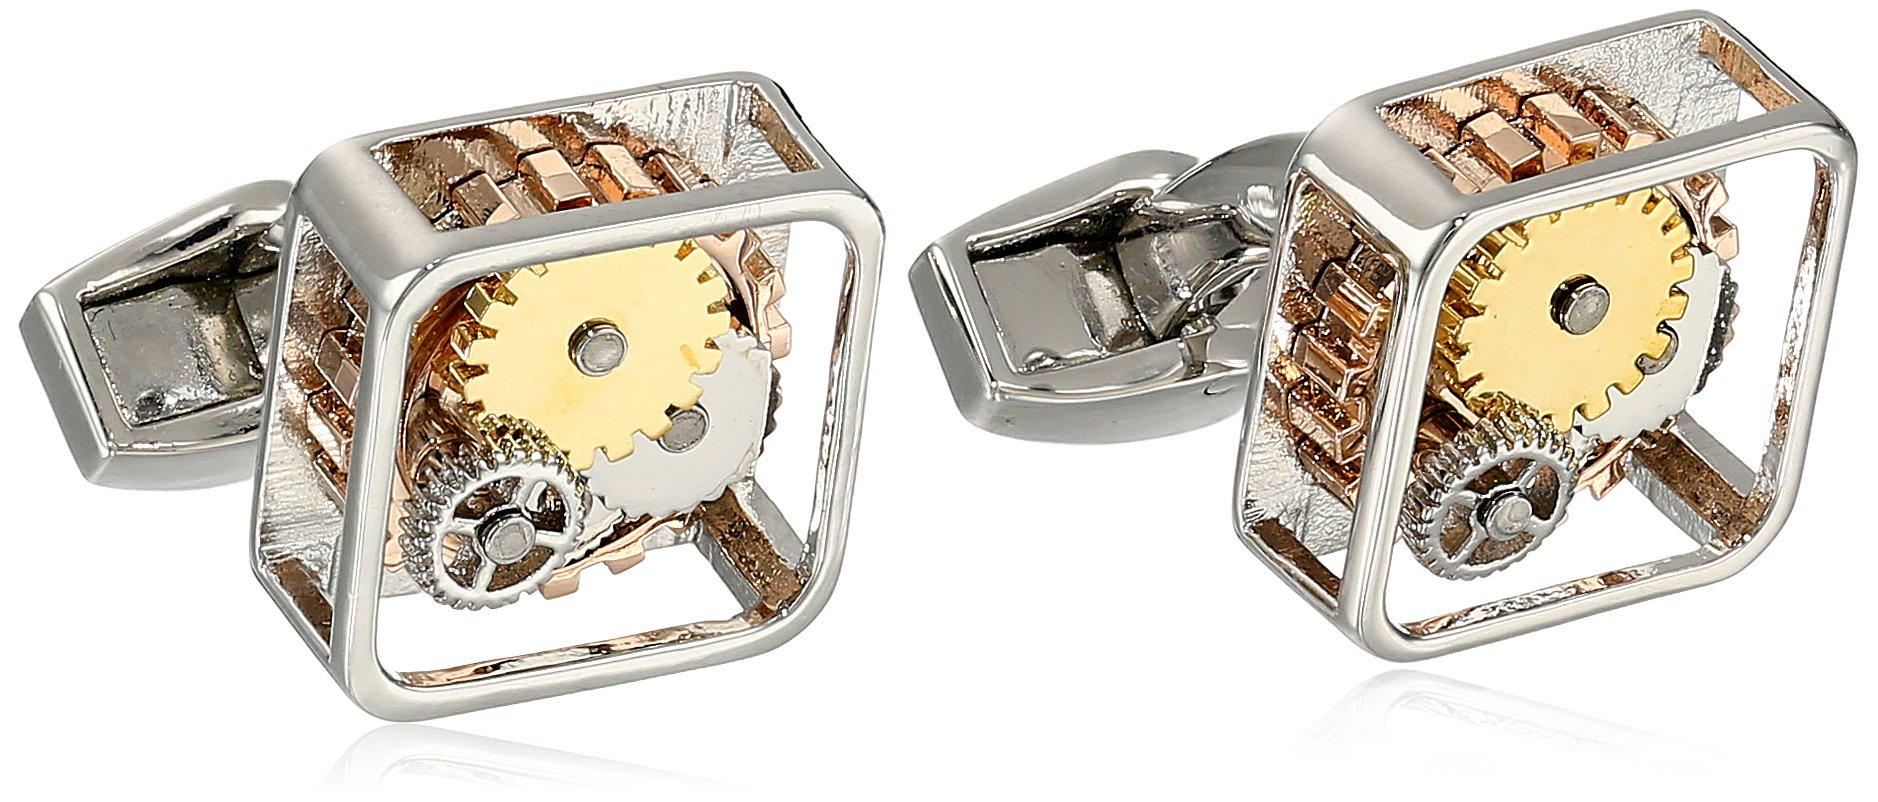 Tateossian Men's ''Mechanical'' Silver Rhodium Plated Gear Square Cufflinks